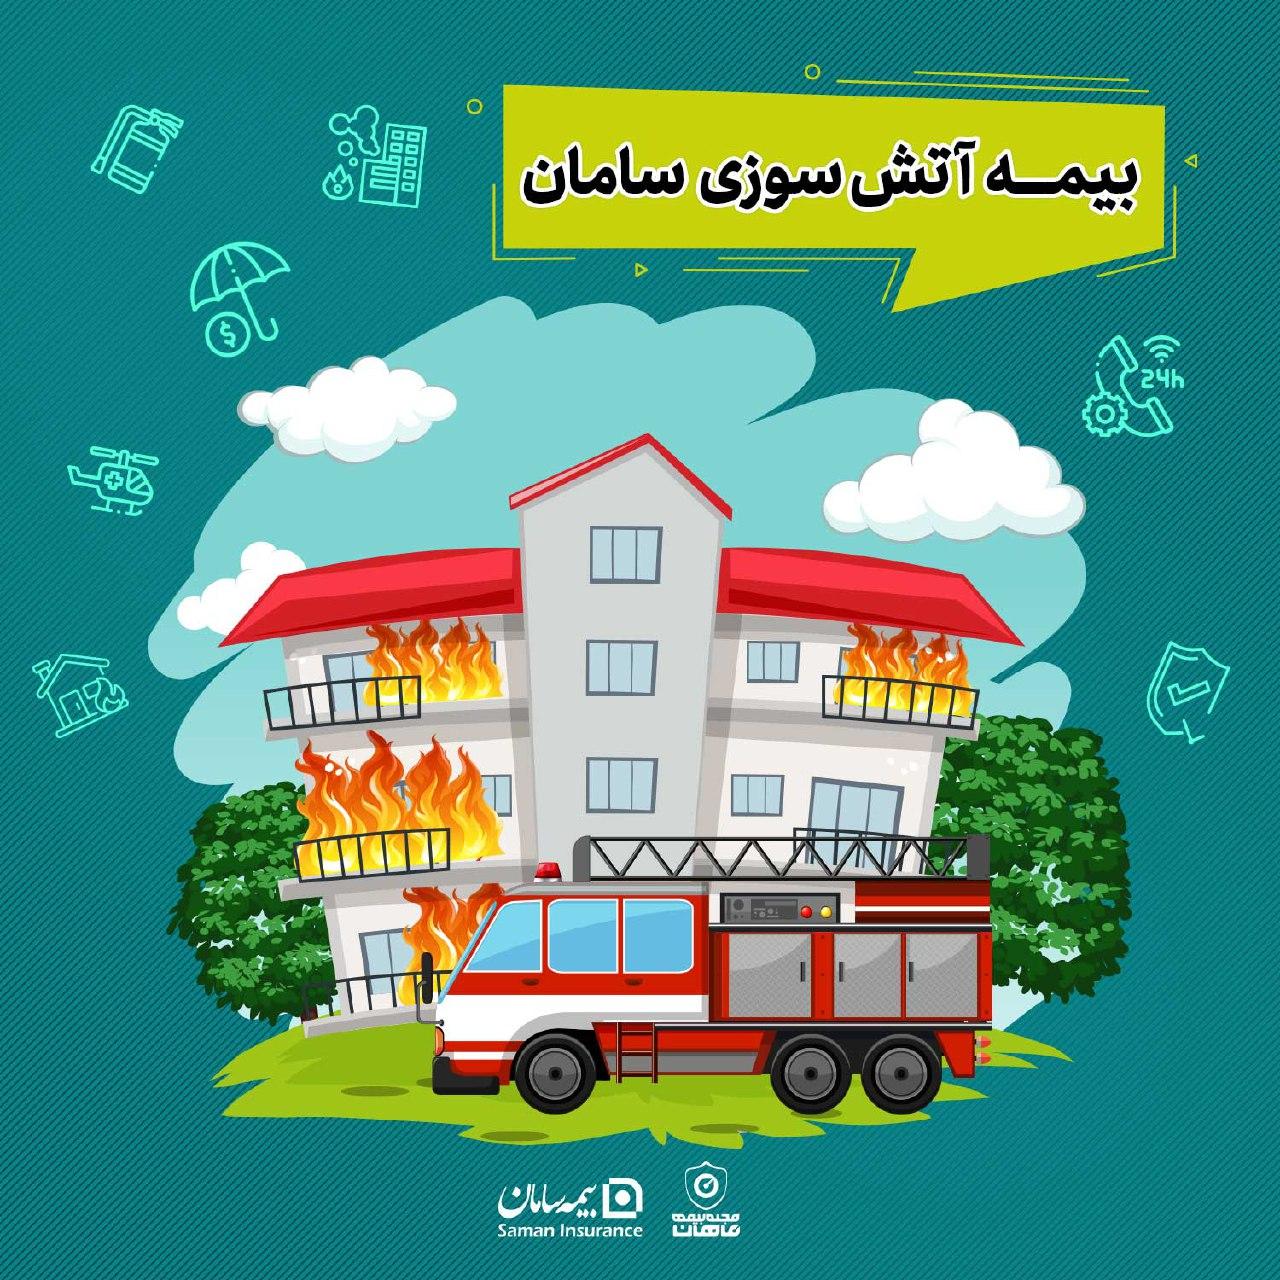 Photo of بیمه آتش سوزی سامان – ارزان ترین بیمه نامه با پوشش زلزله